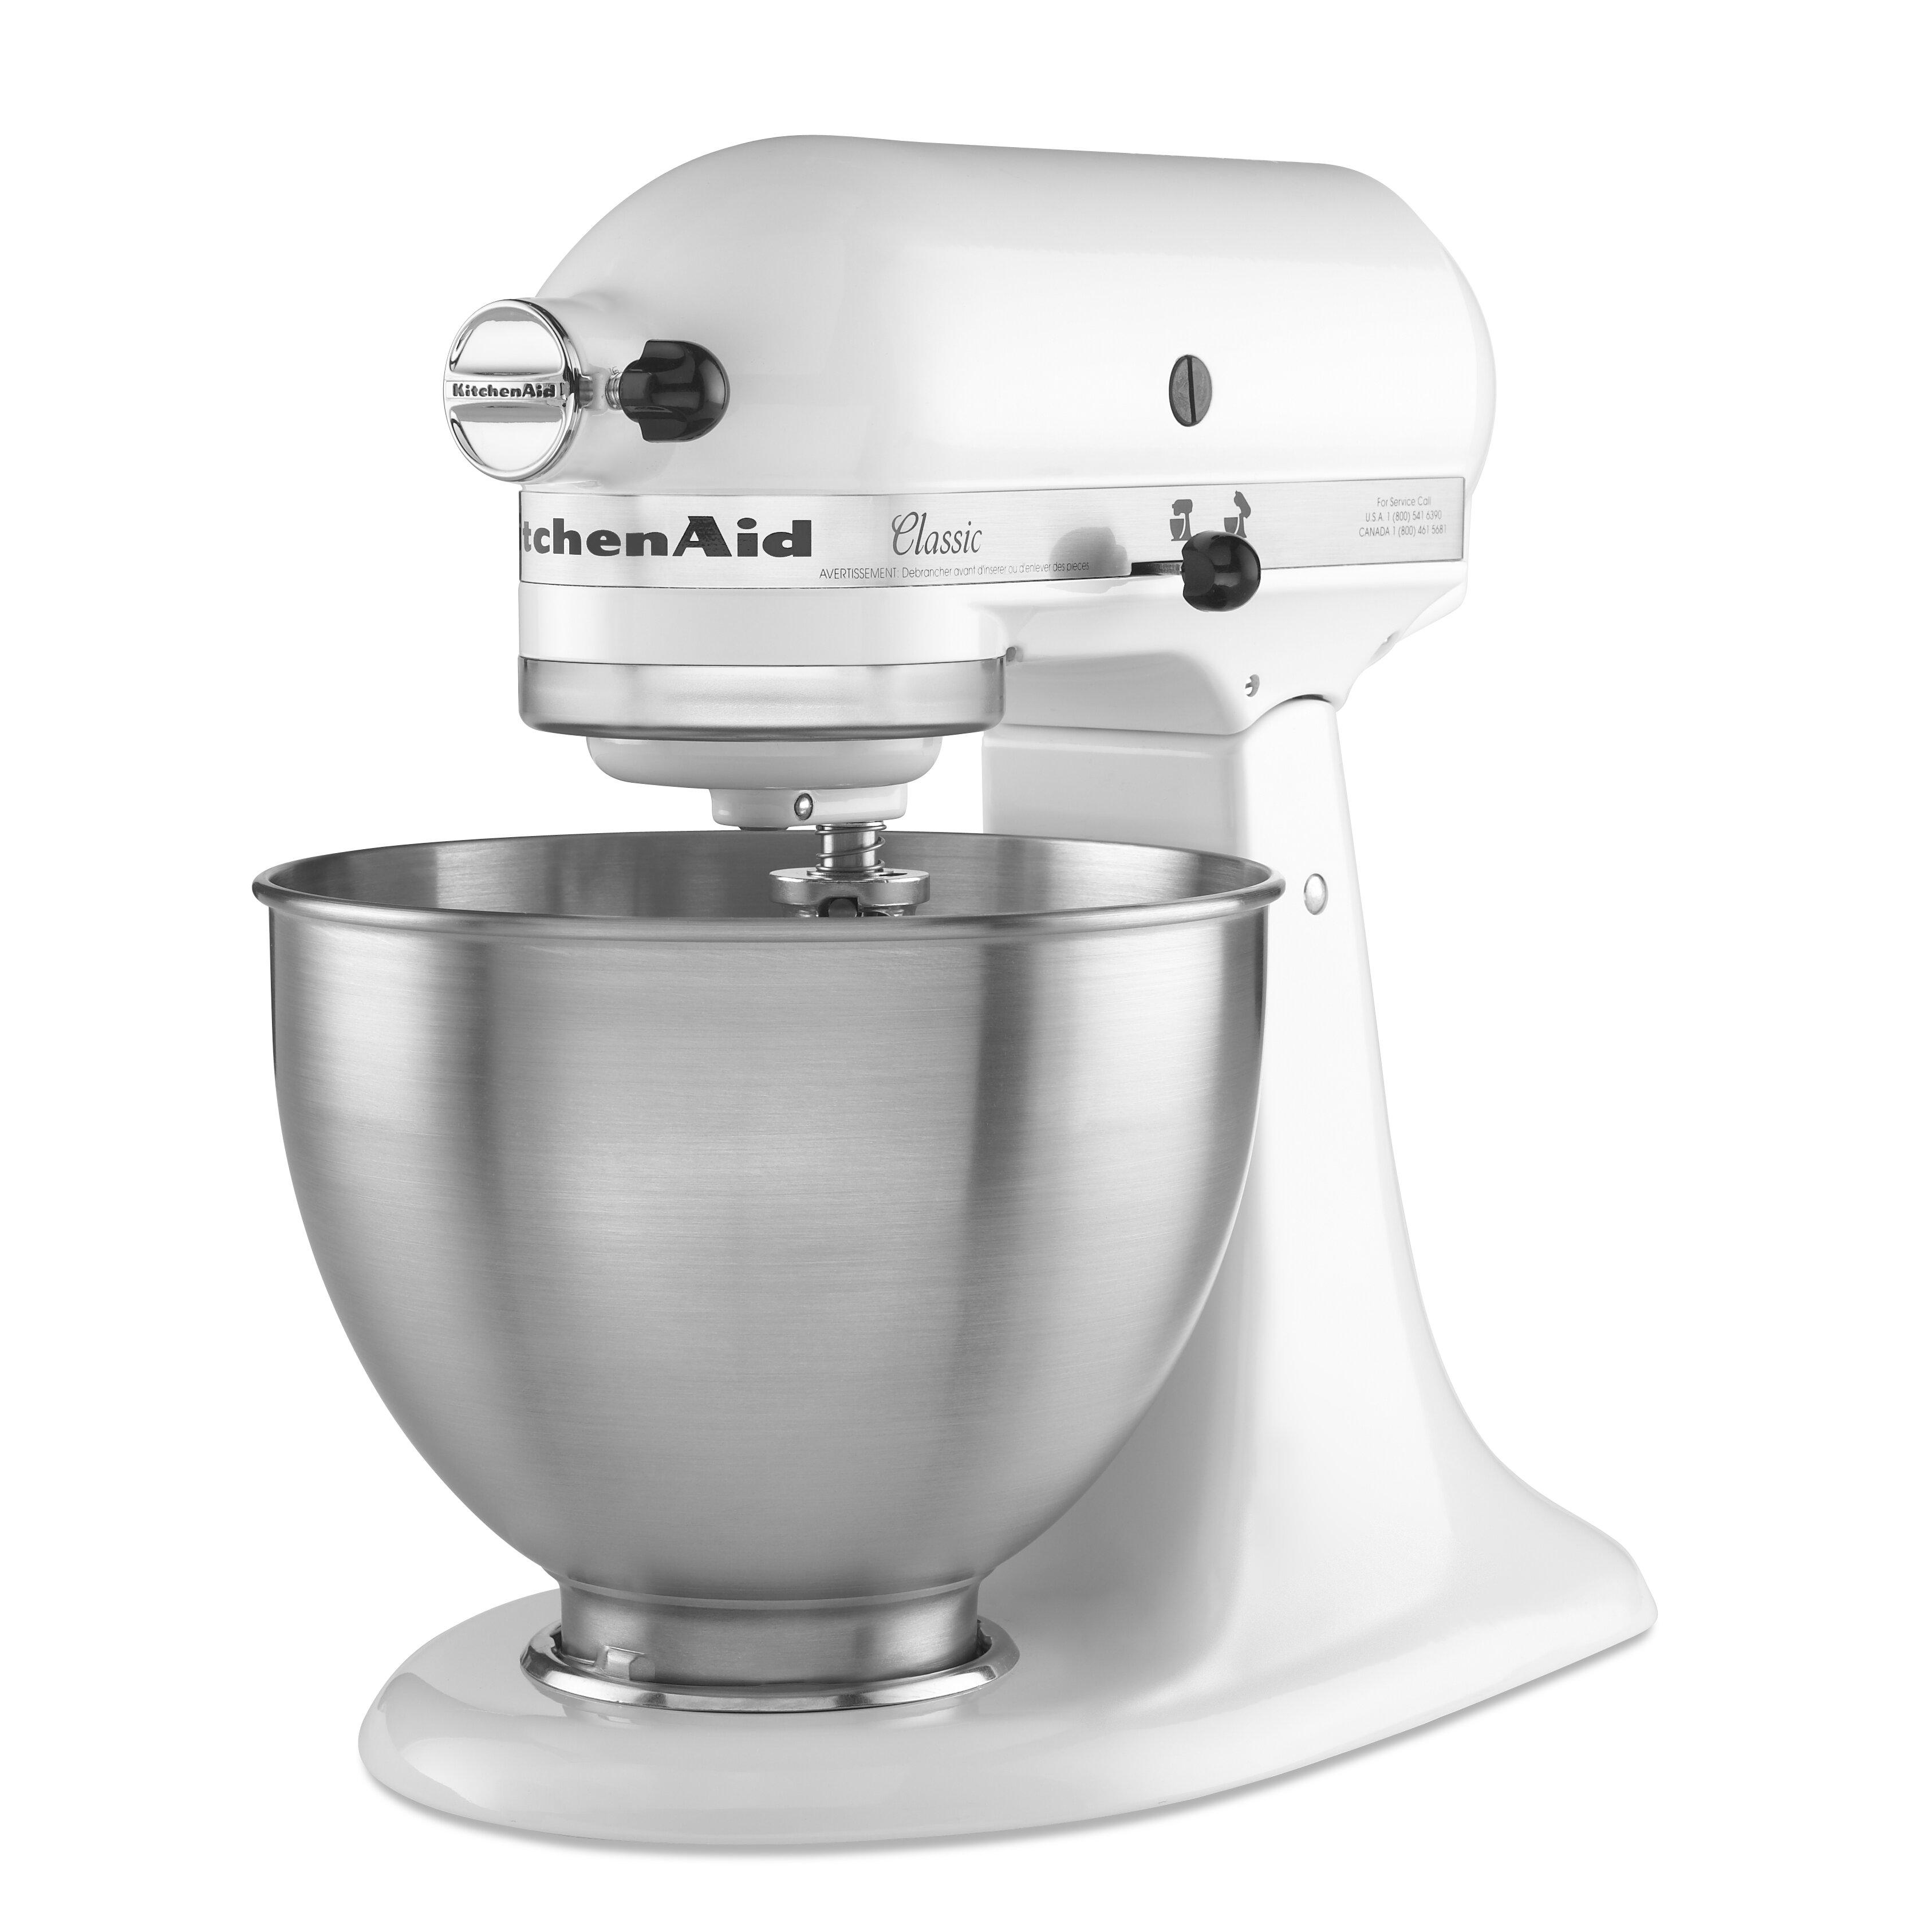 KitchenAid Classic Series 4.5 Qt. Stand Mixer & Reviews | Wayfair